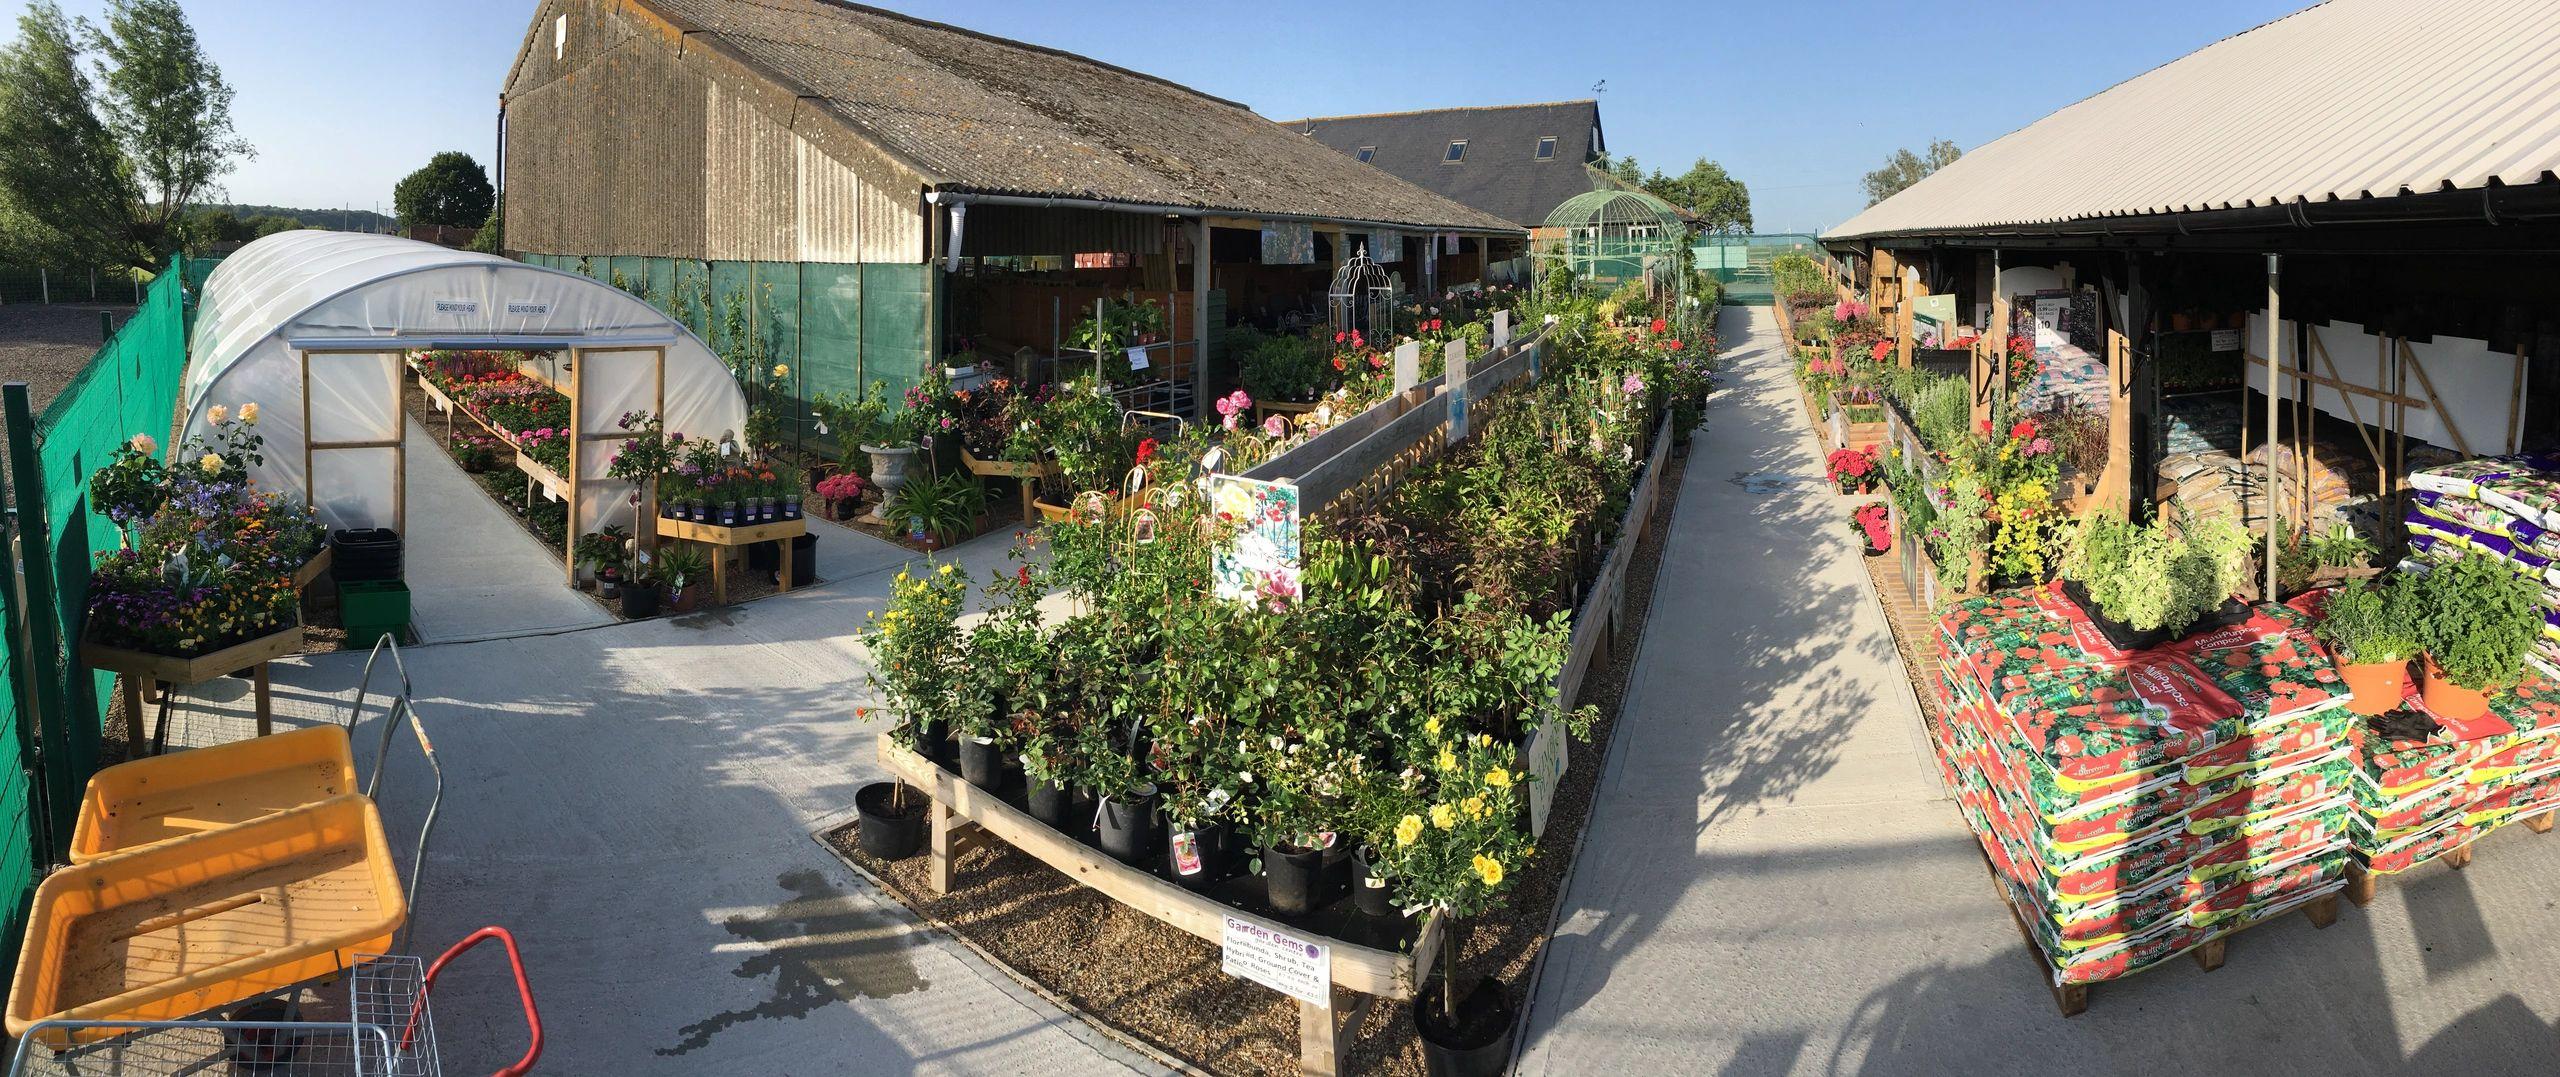 Fairlight East Sussex Garden Gems Plant Nursery Garden Centre